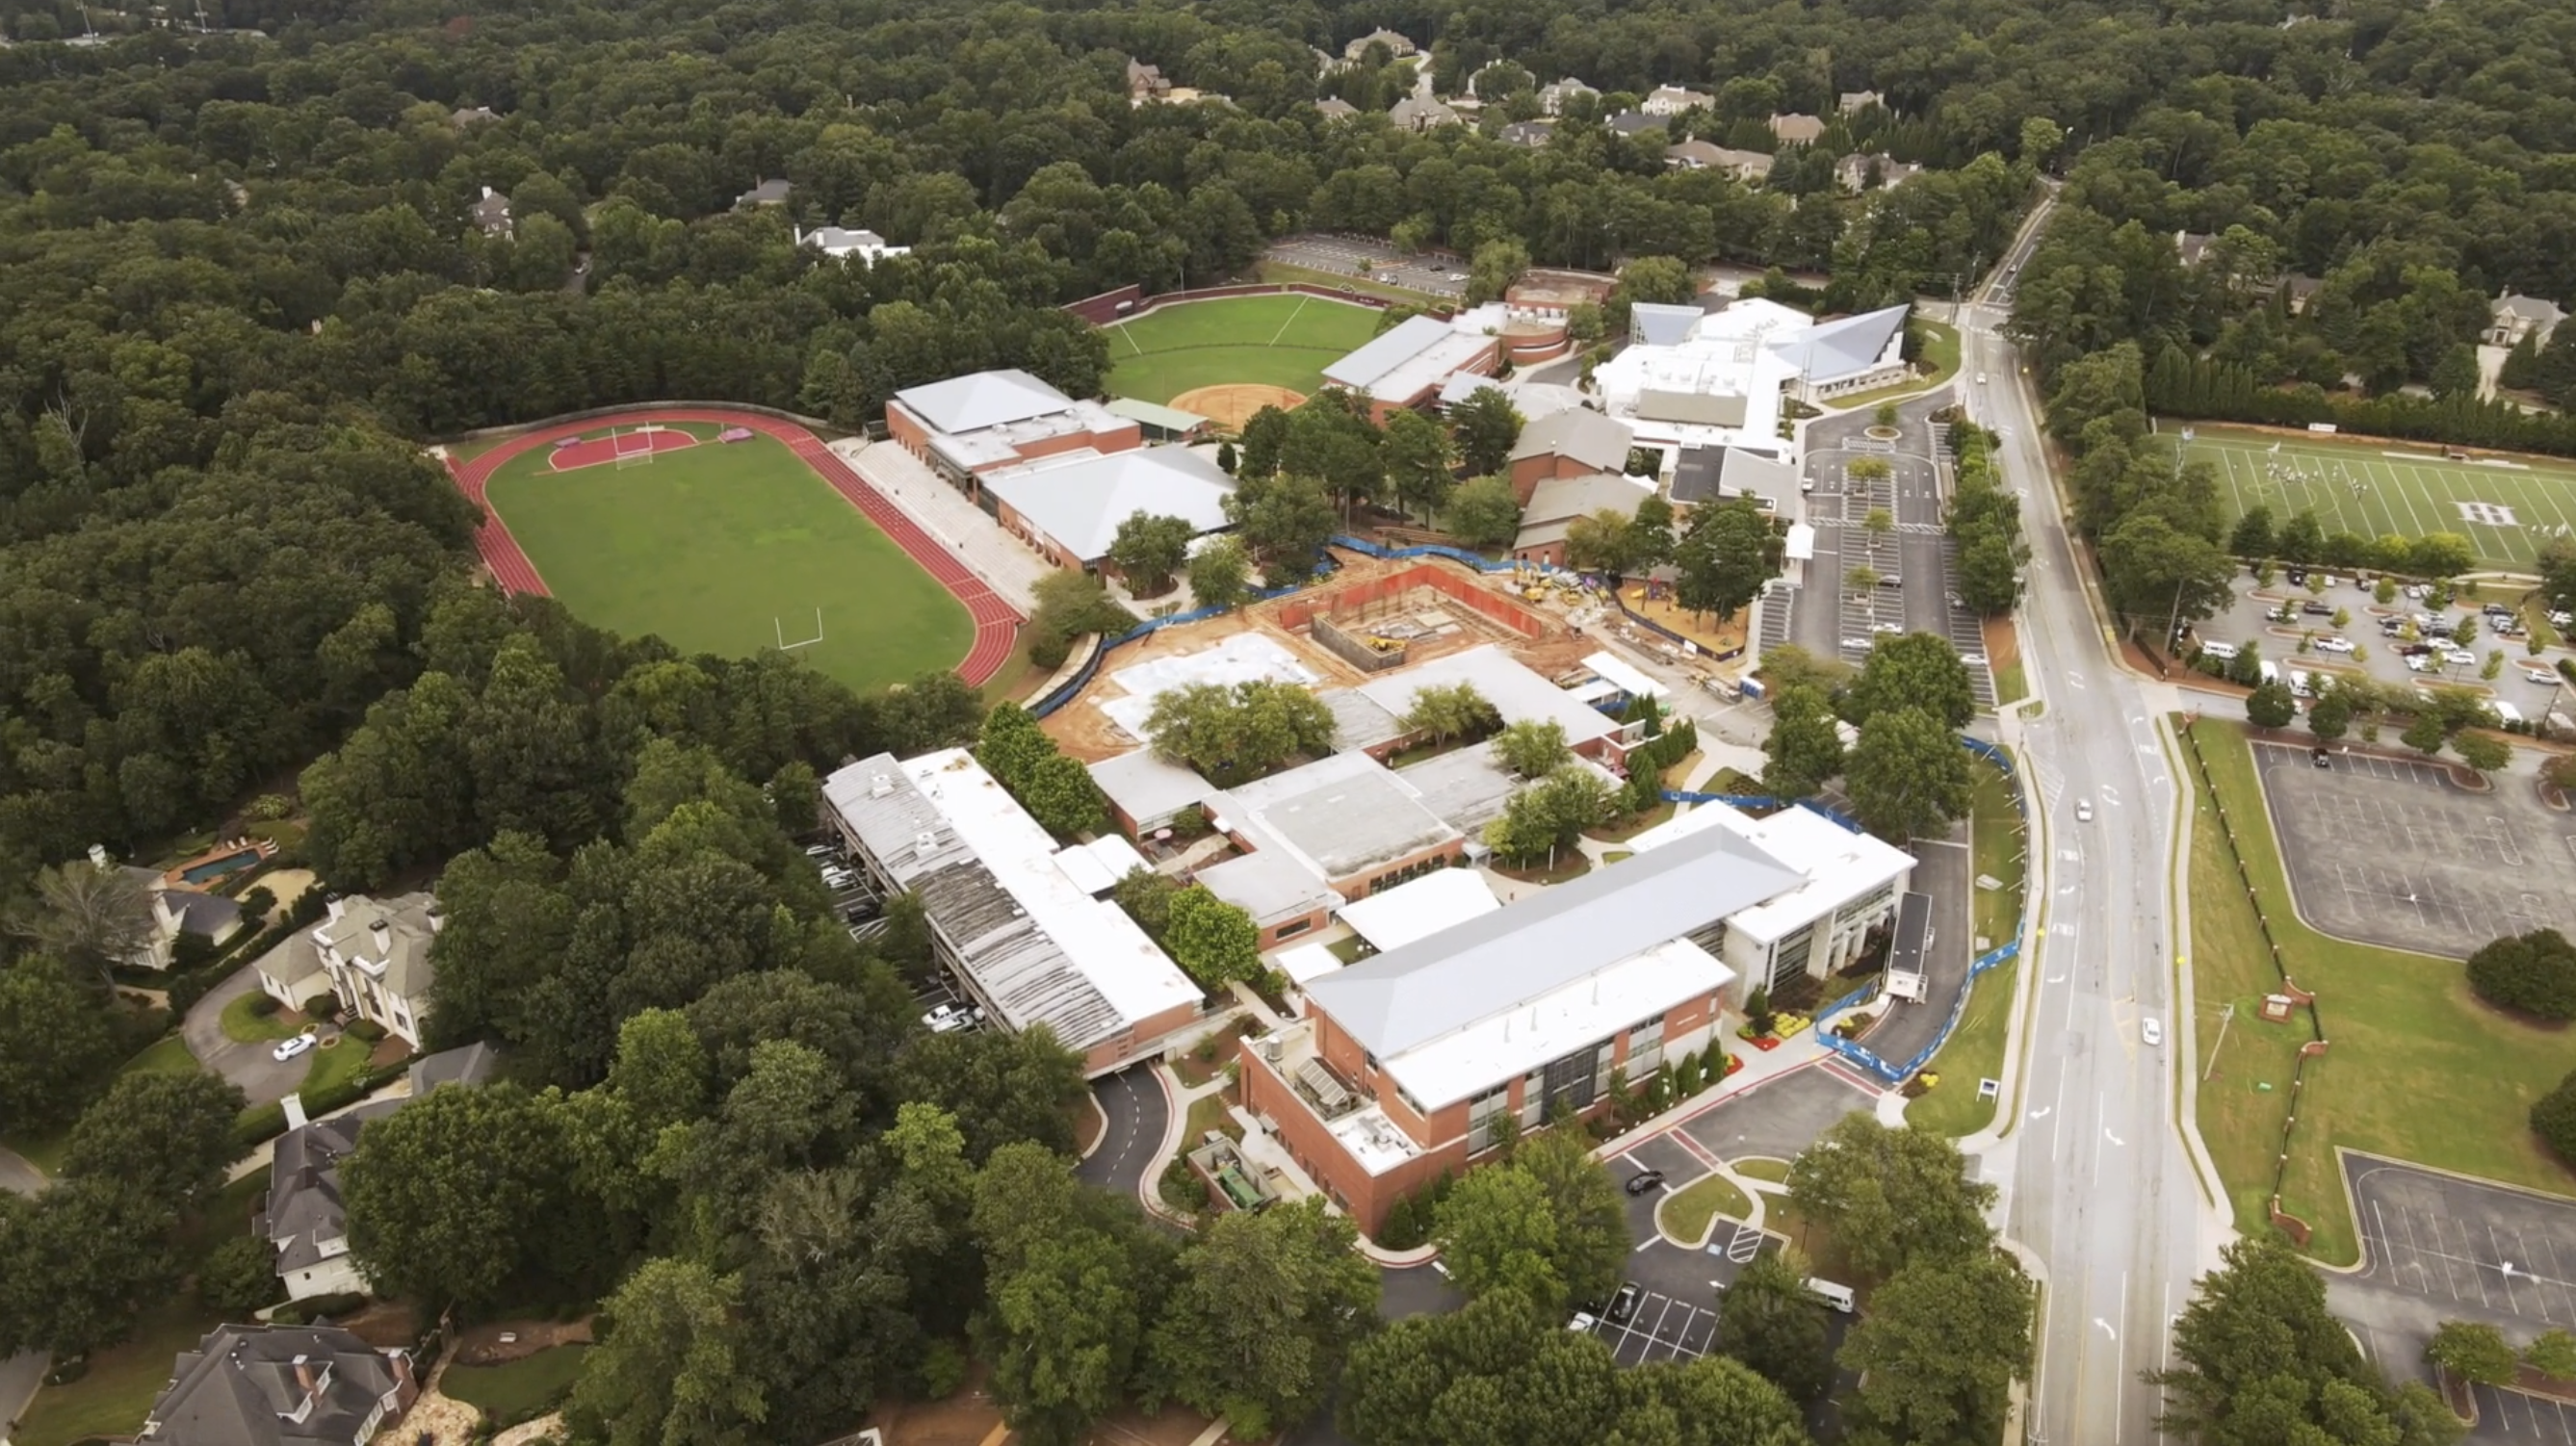 Aerial Photo of HIES Campus